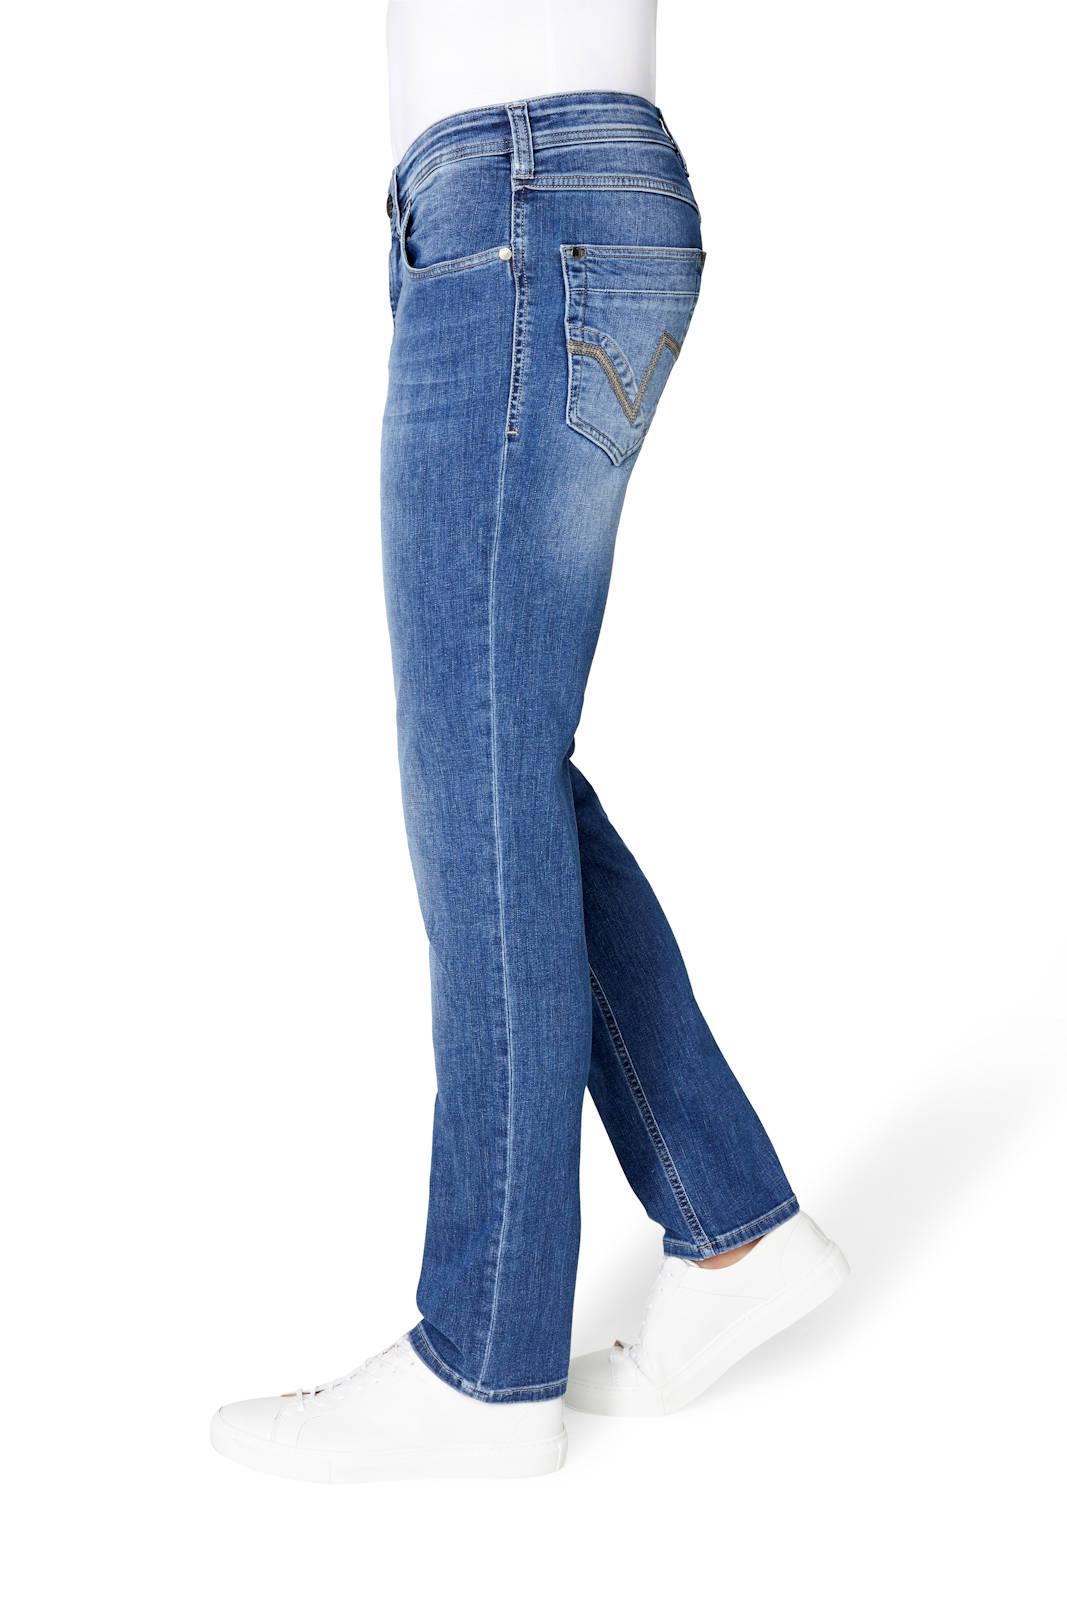 Atelier-GARDEUR-Jeans-BILL-8-Modern-Fit-Herren-Hose-Slim-Leg-Denim-NEU Indexbild 3